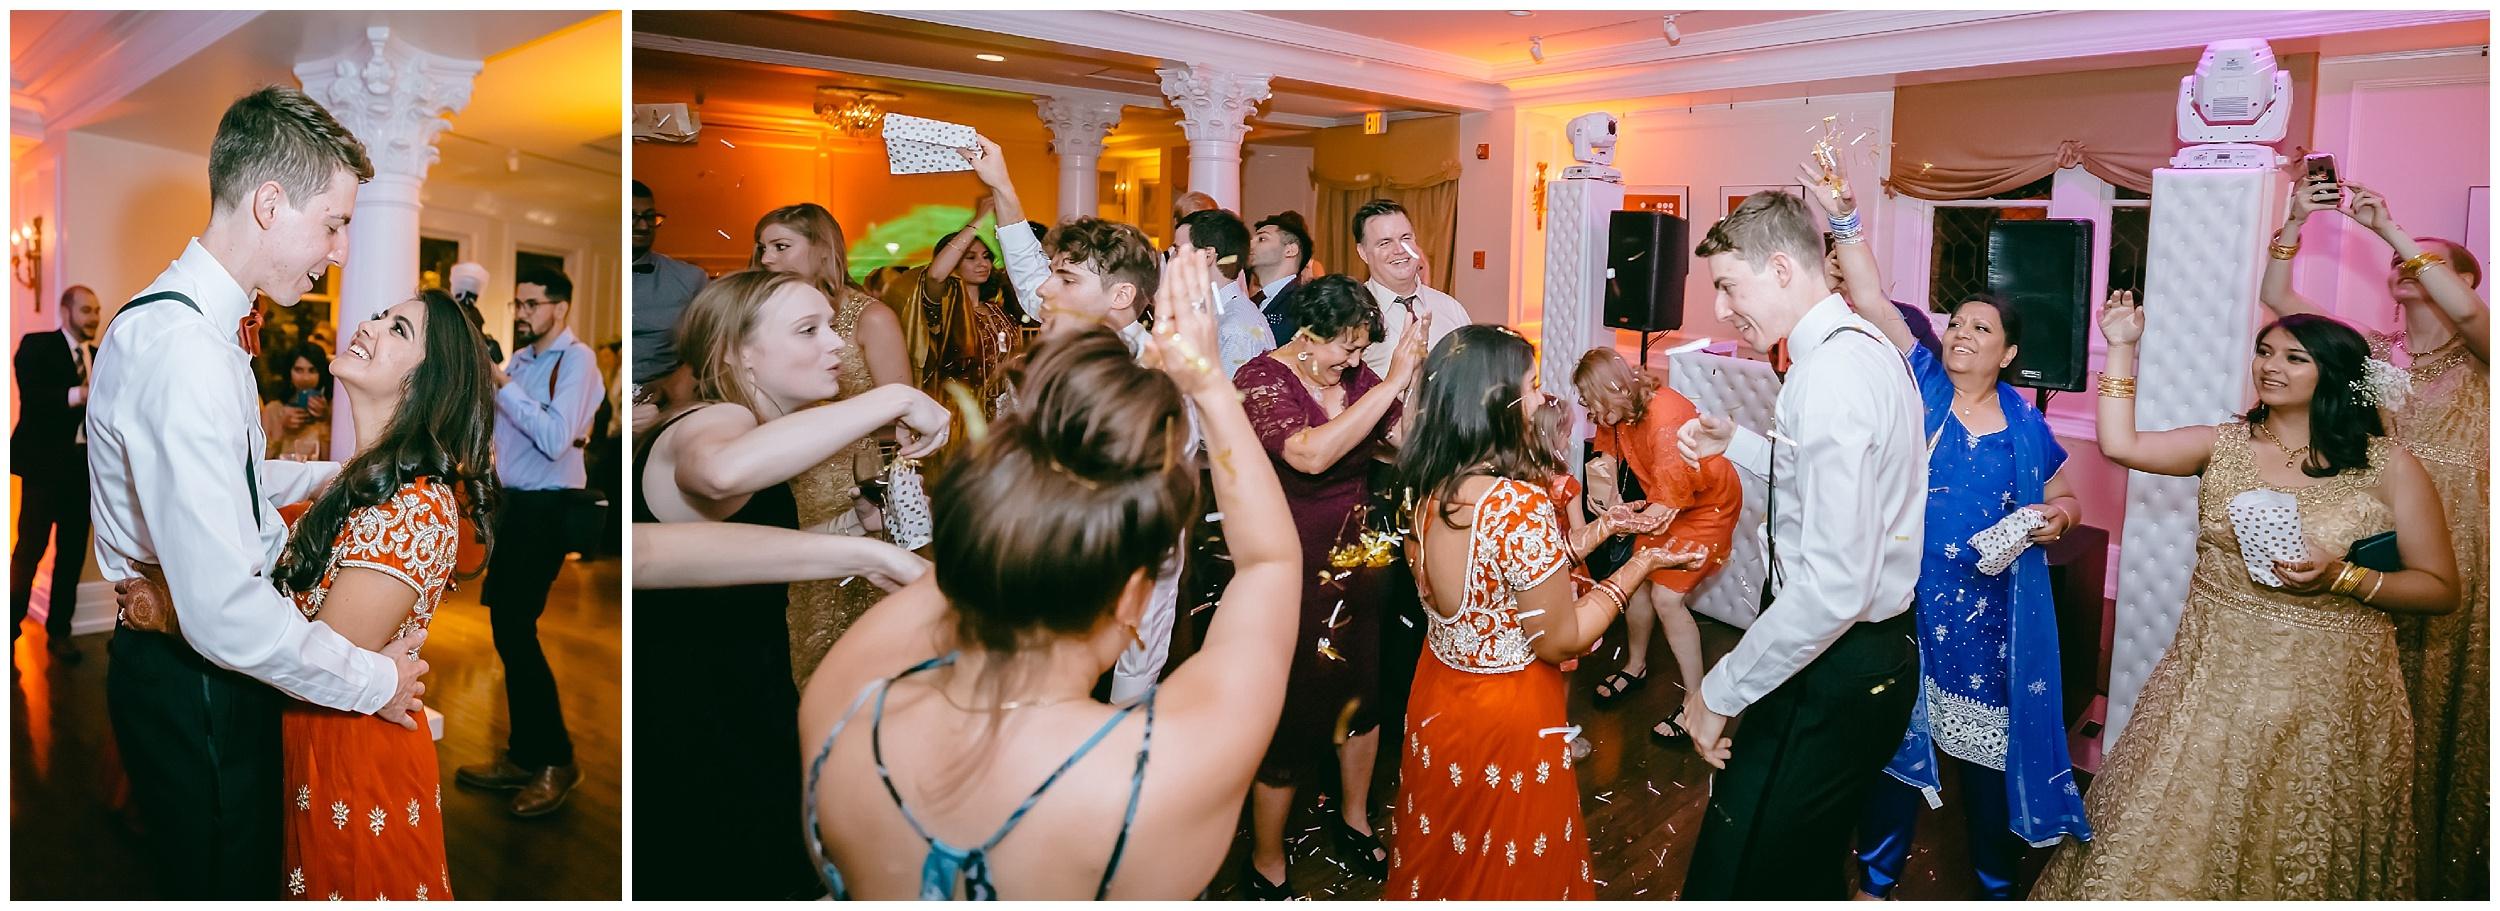 reception dance party husband wife confetti Whittemore House wedding Washington DC